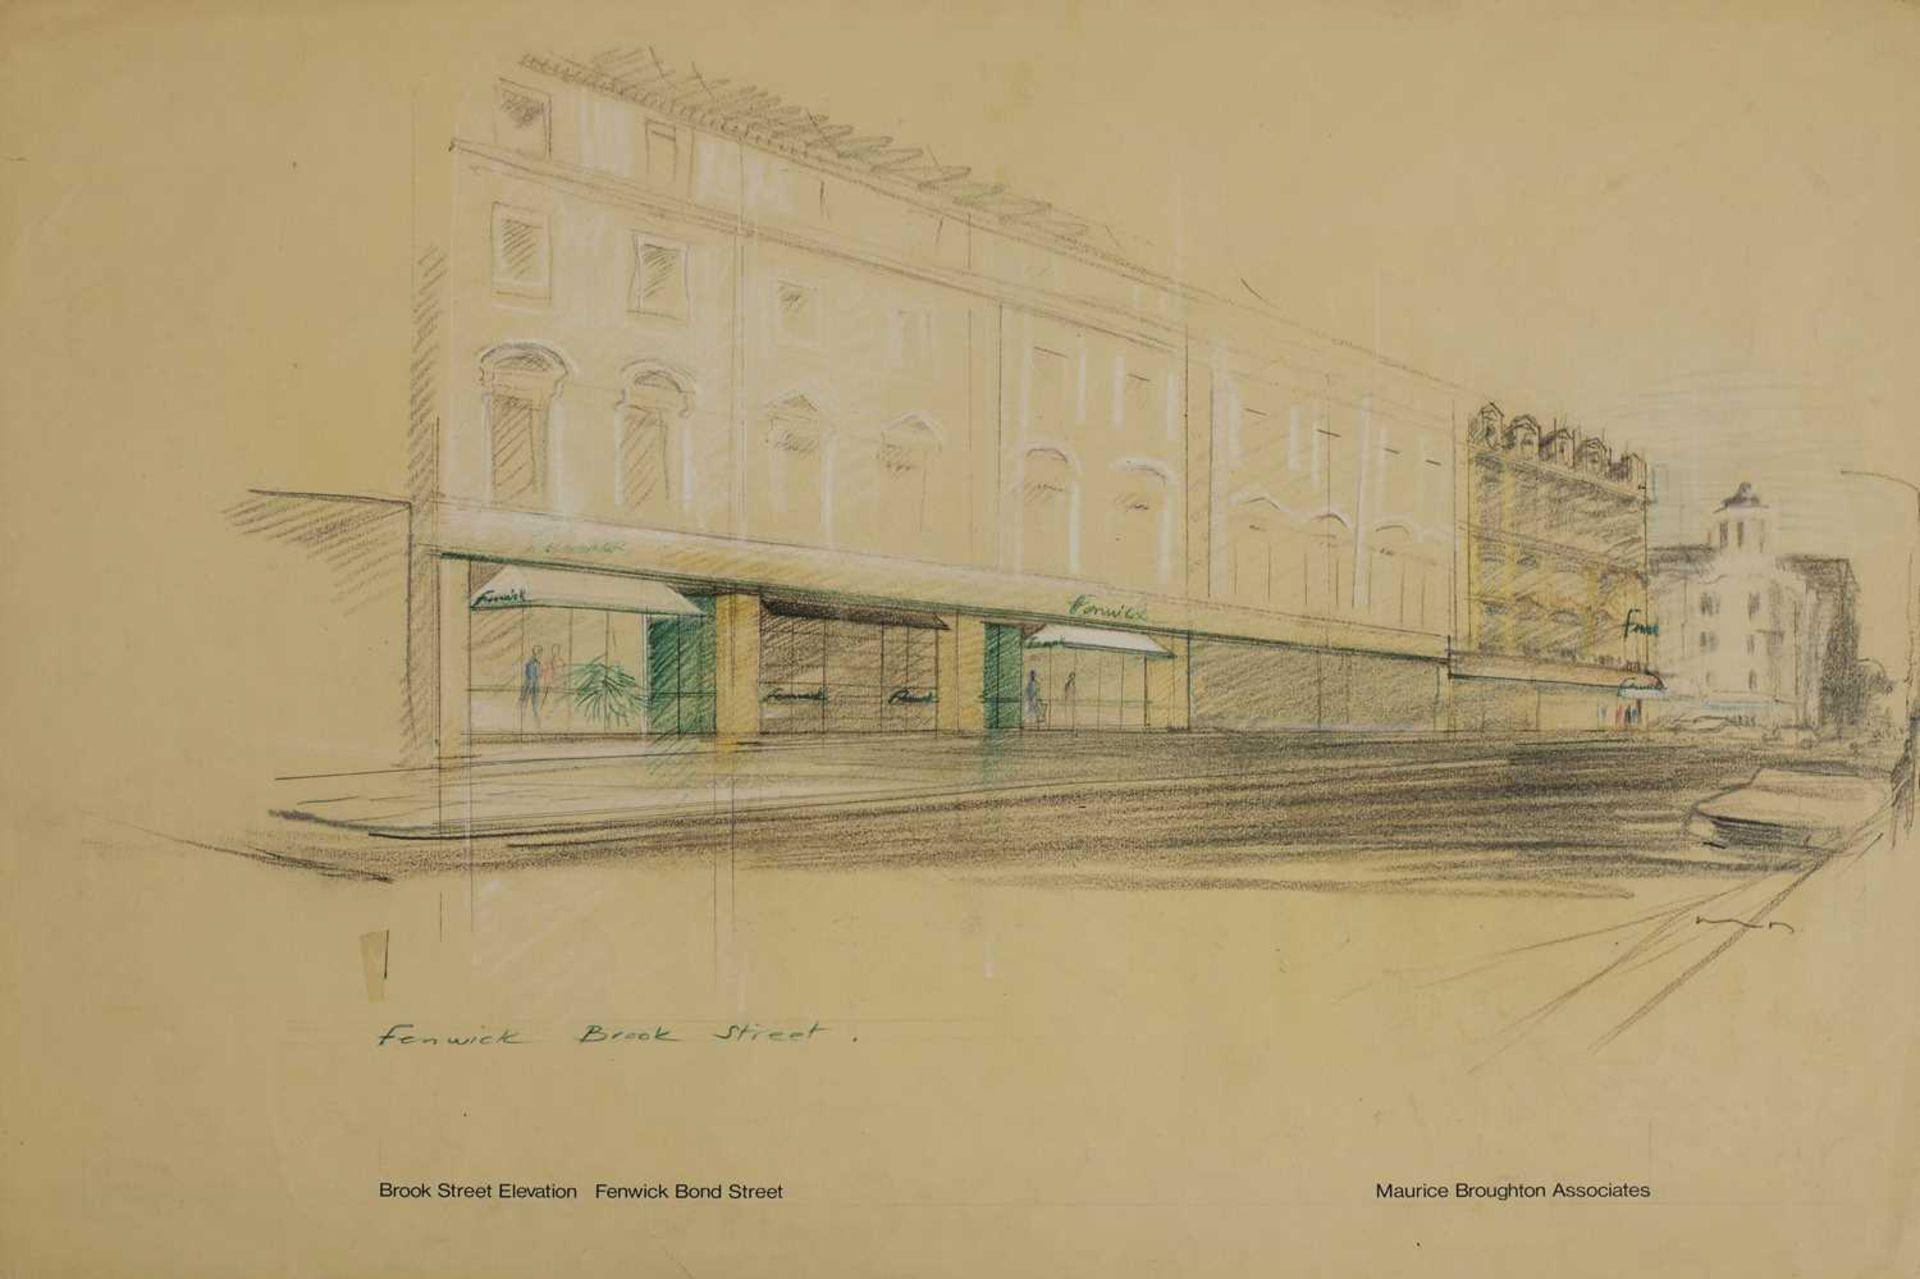 Maurice Broughton Associates, - Image 10 of 10